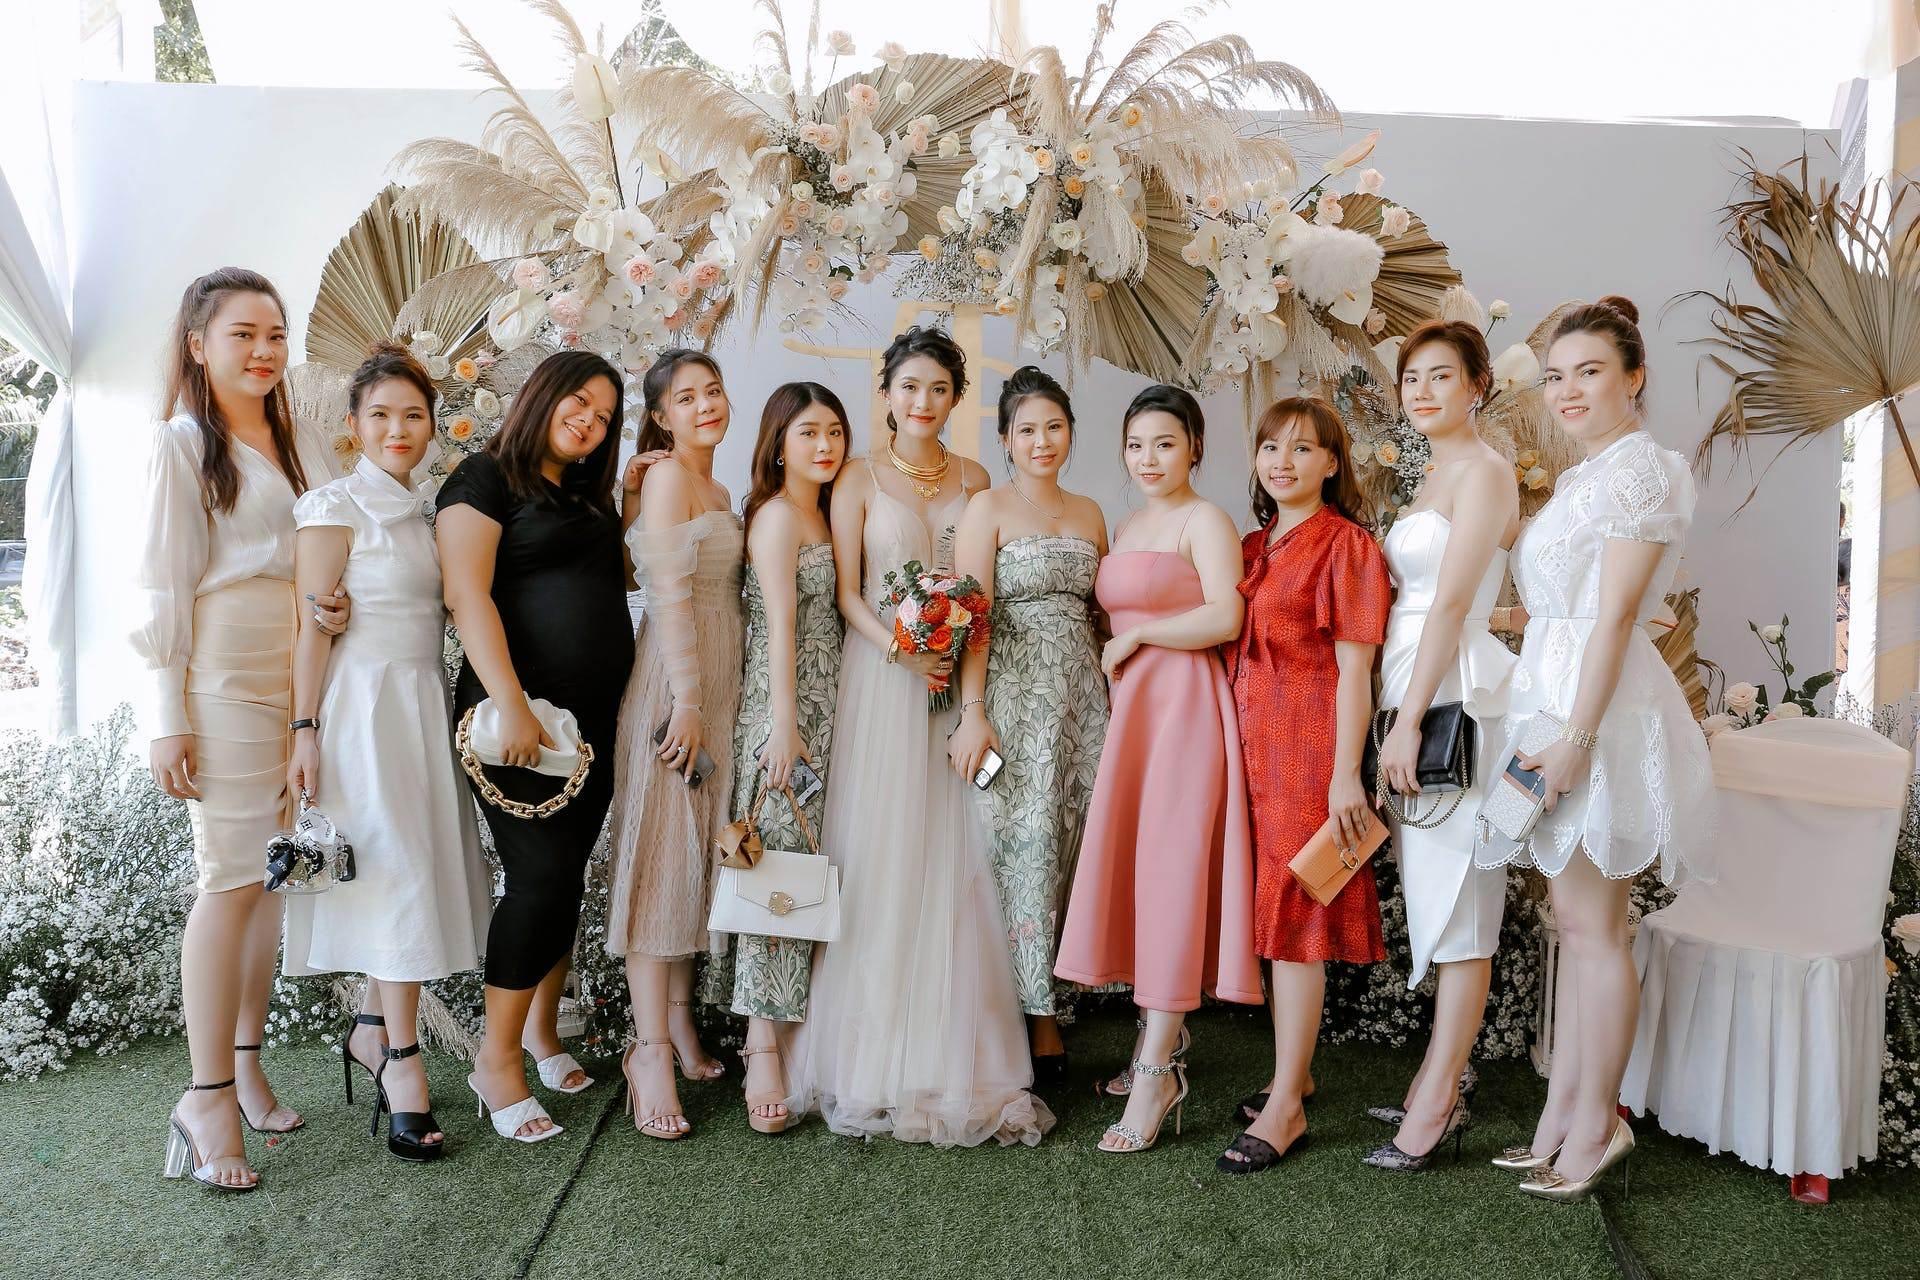 Wedding-Dresses-3475